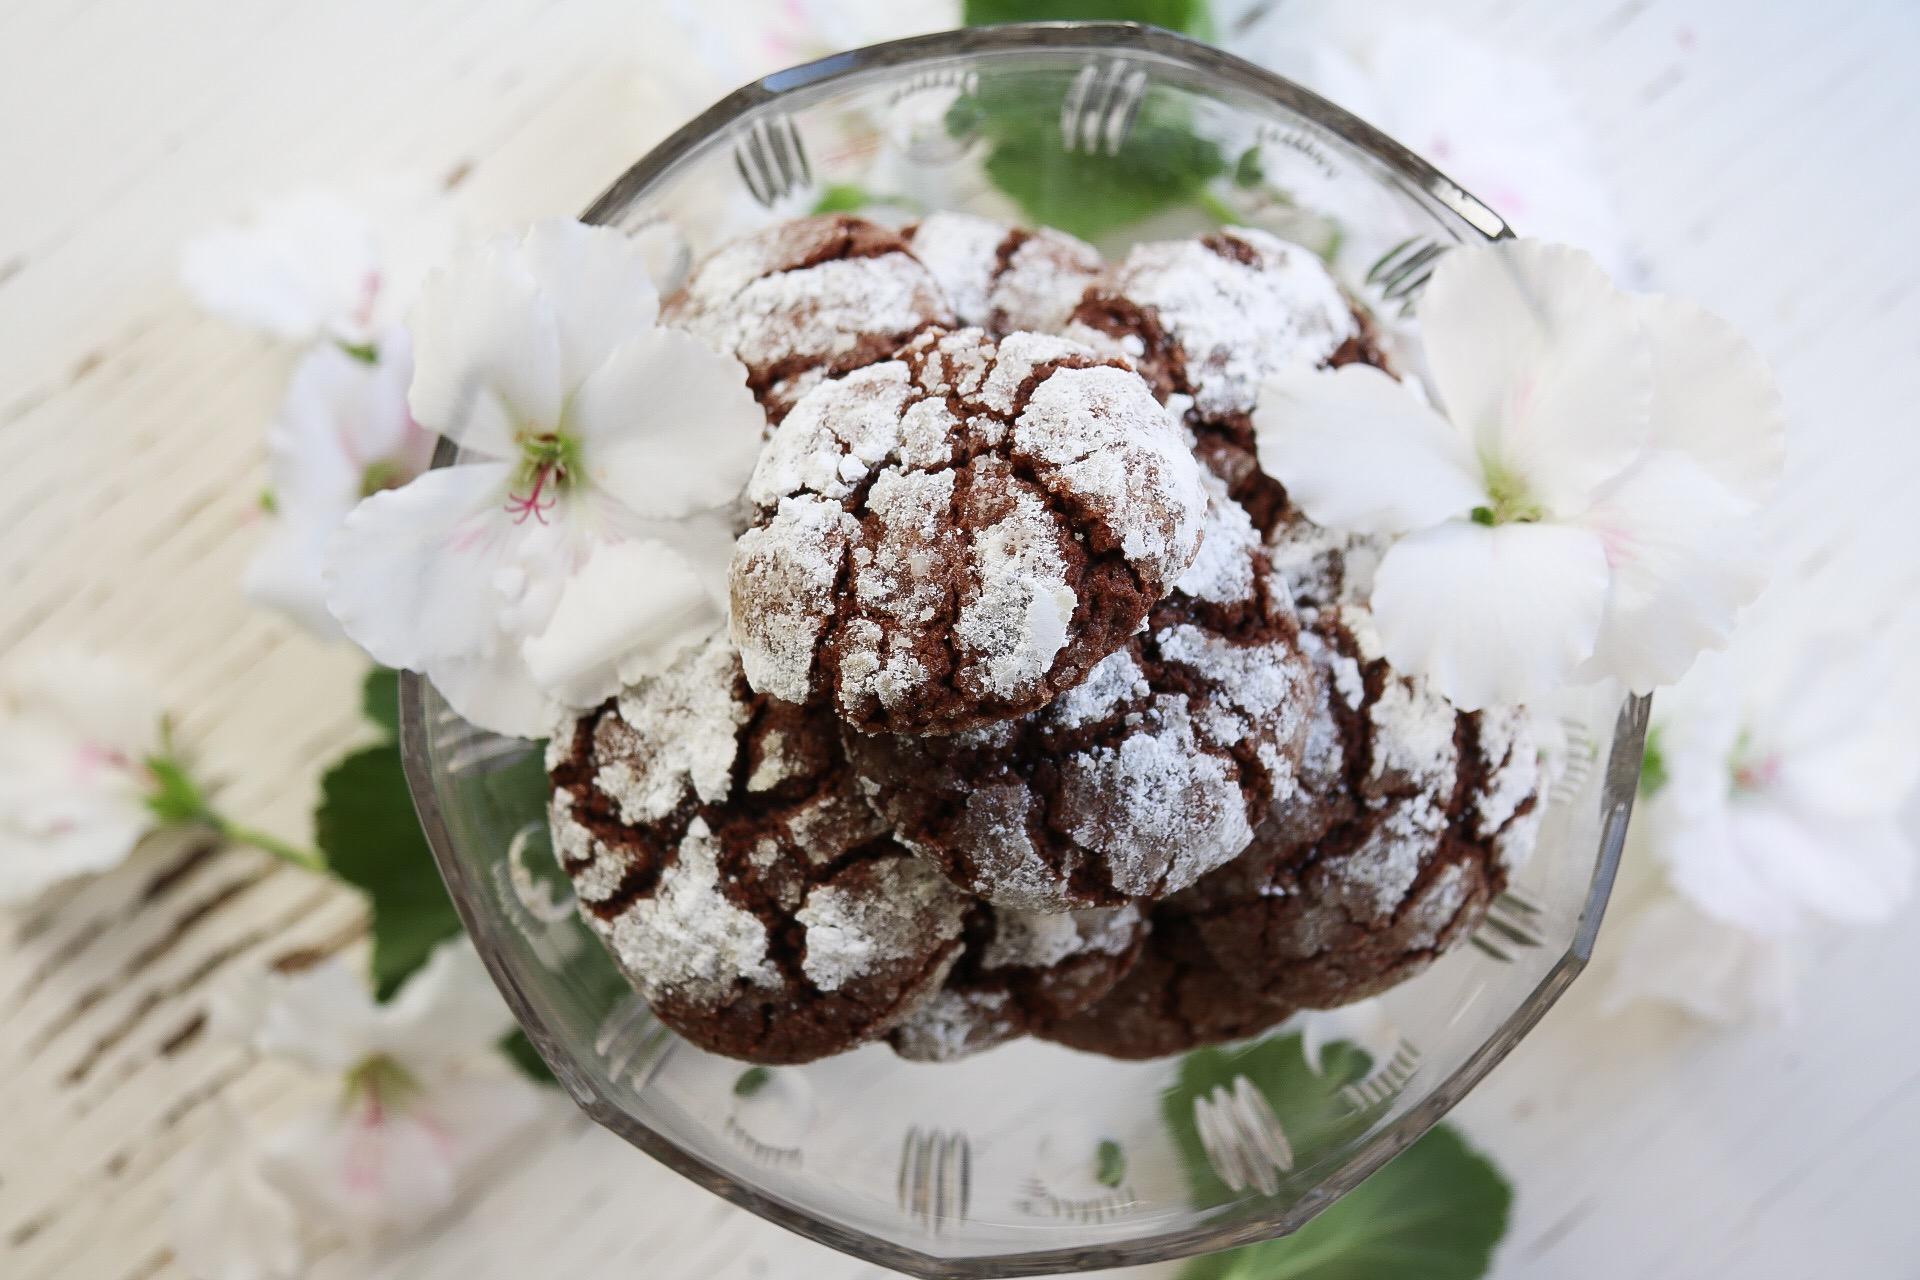 Smaskiga chokladkakor